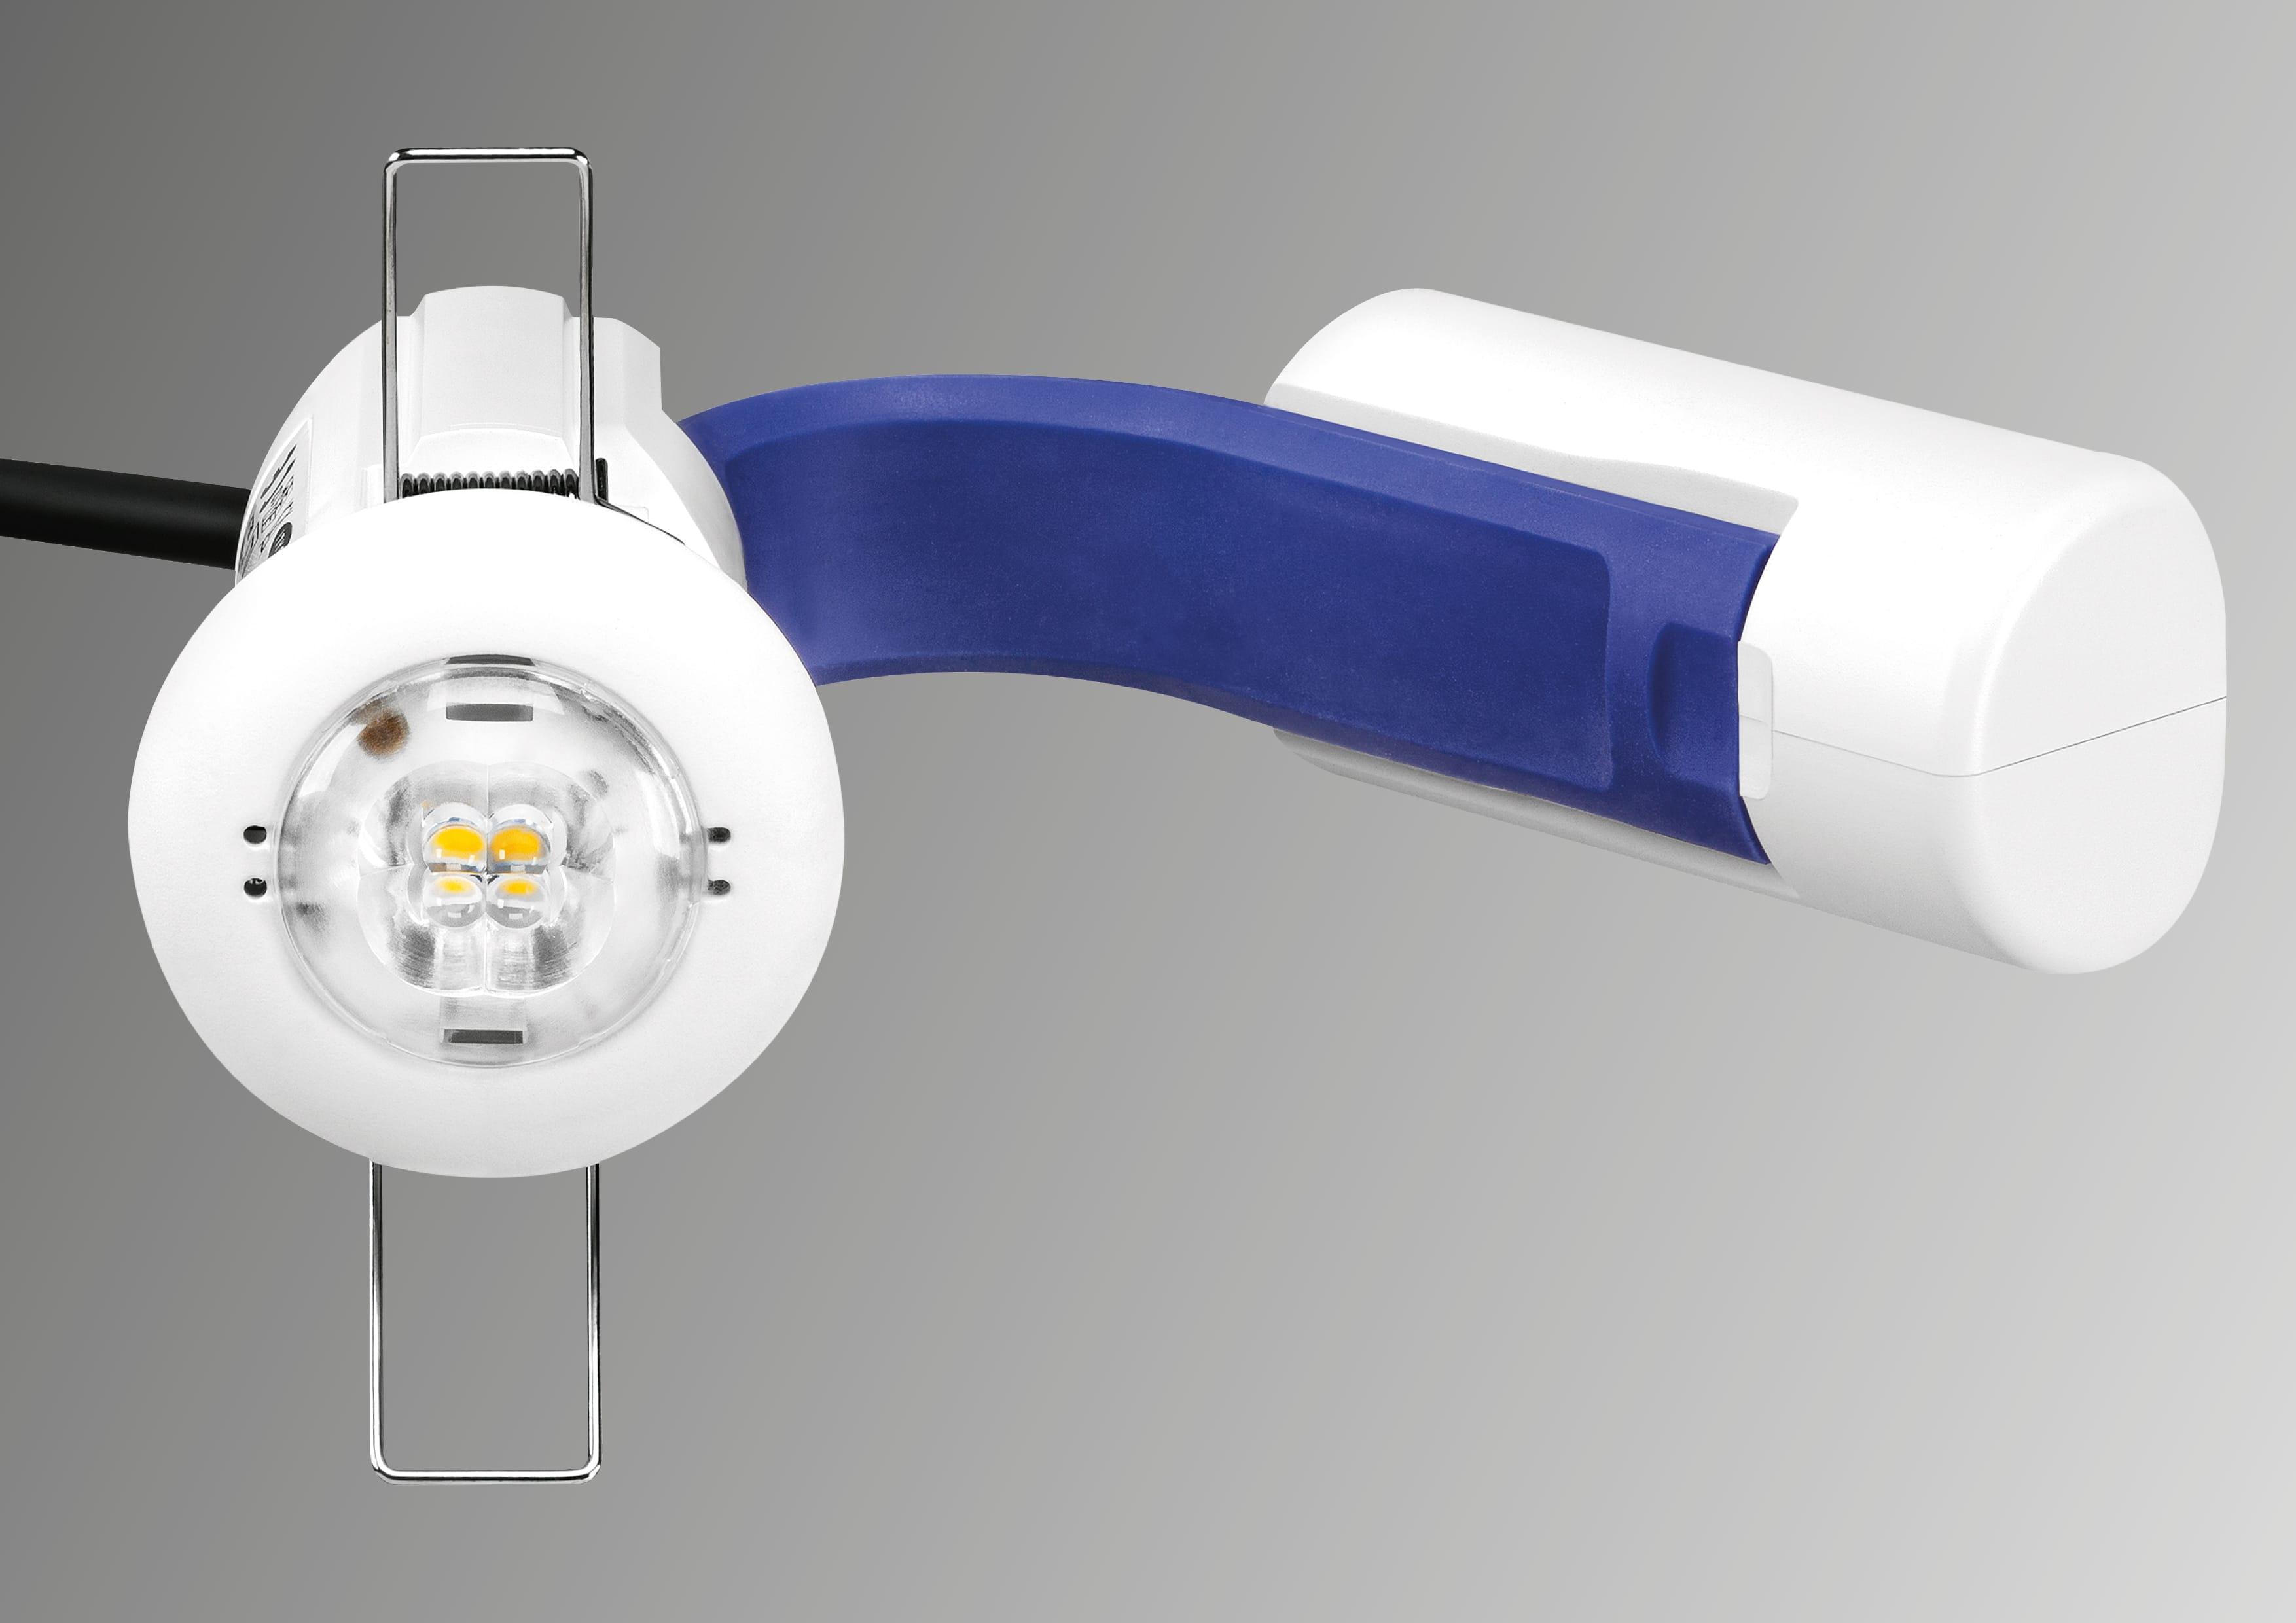 Mini Emergency Light By 9013 Transistor